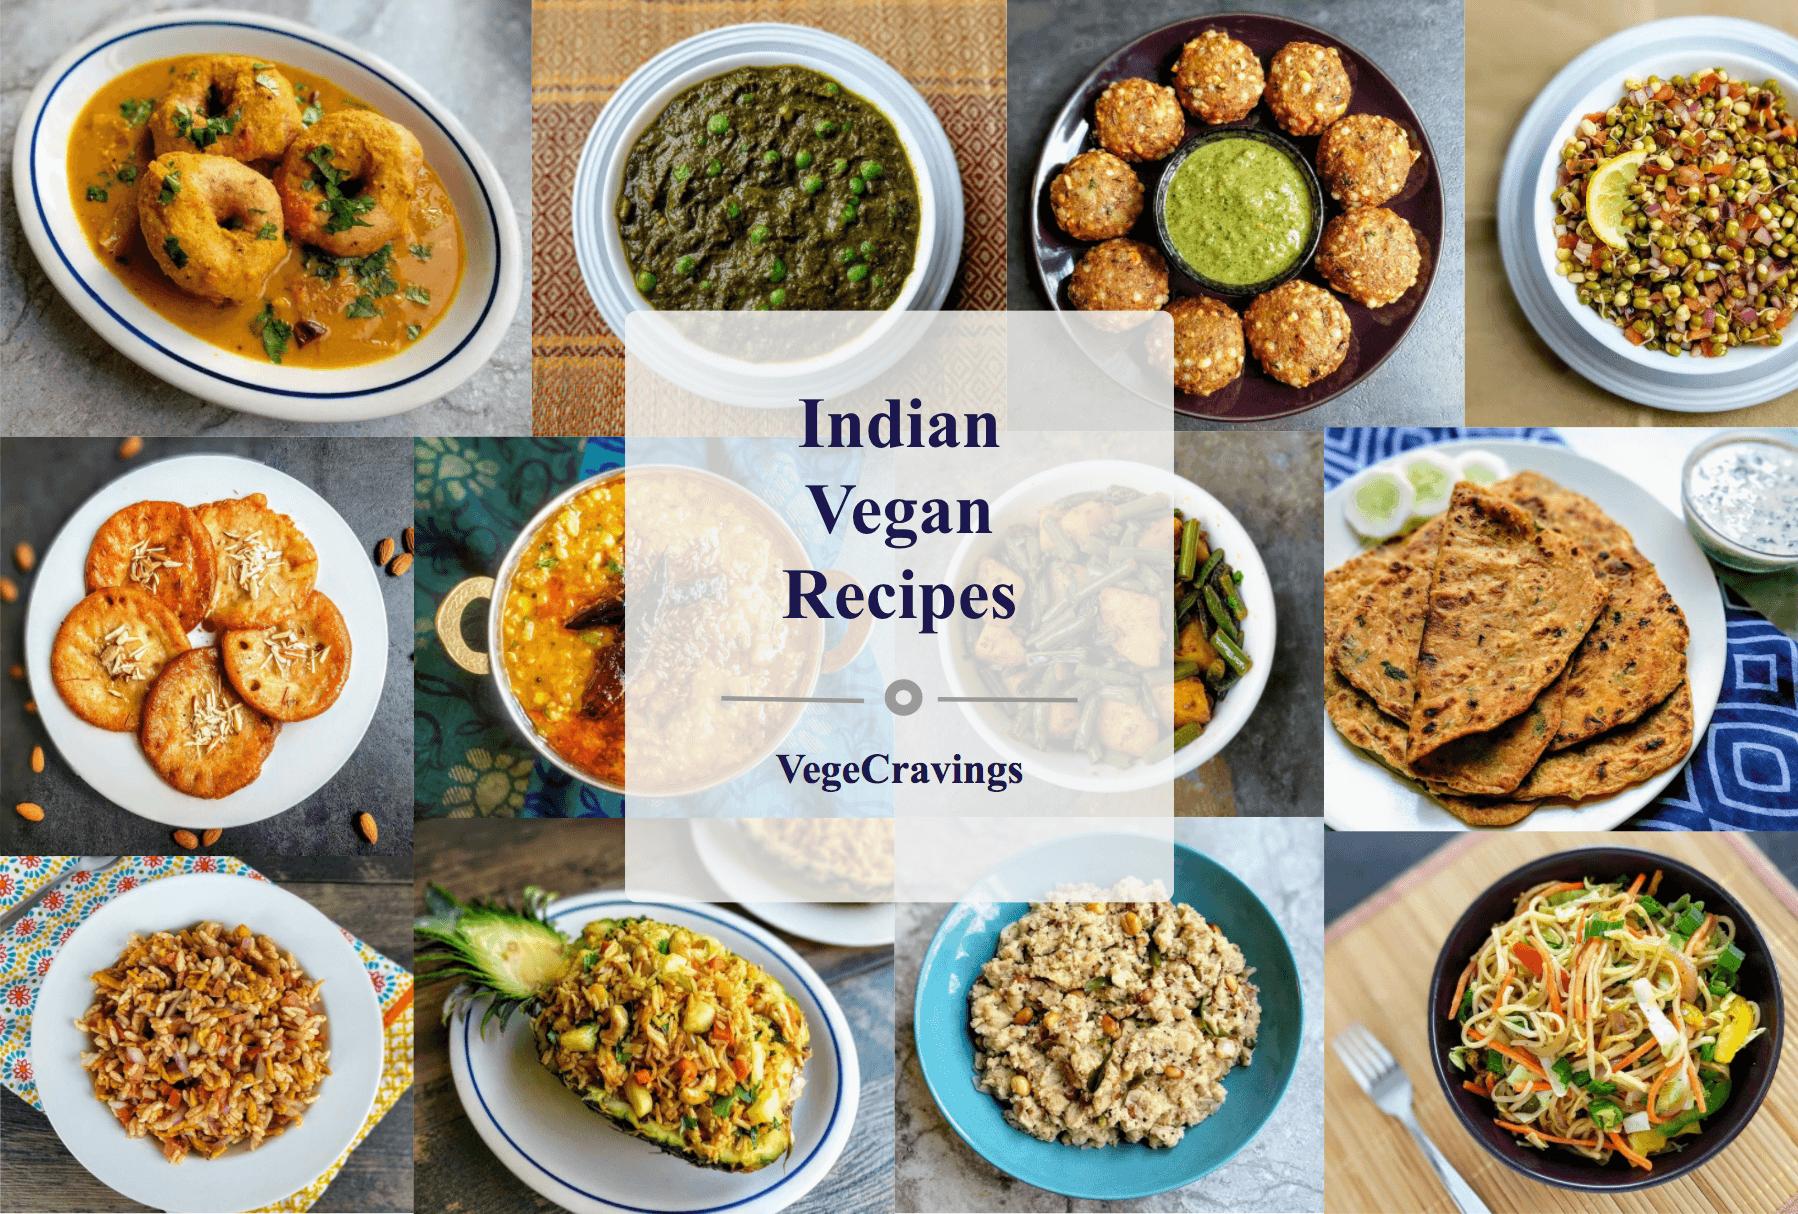 Vegan Recipes Collections